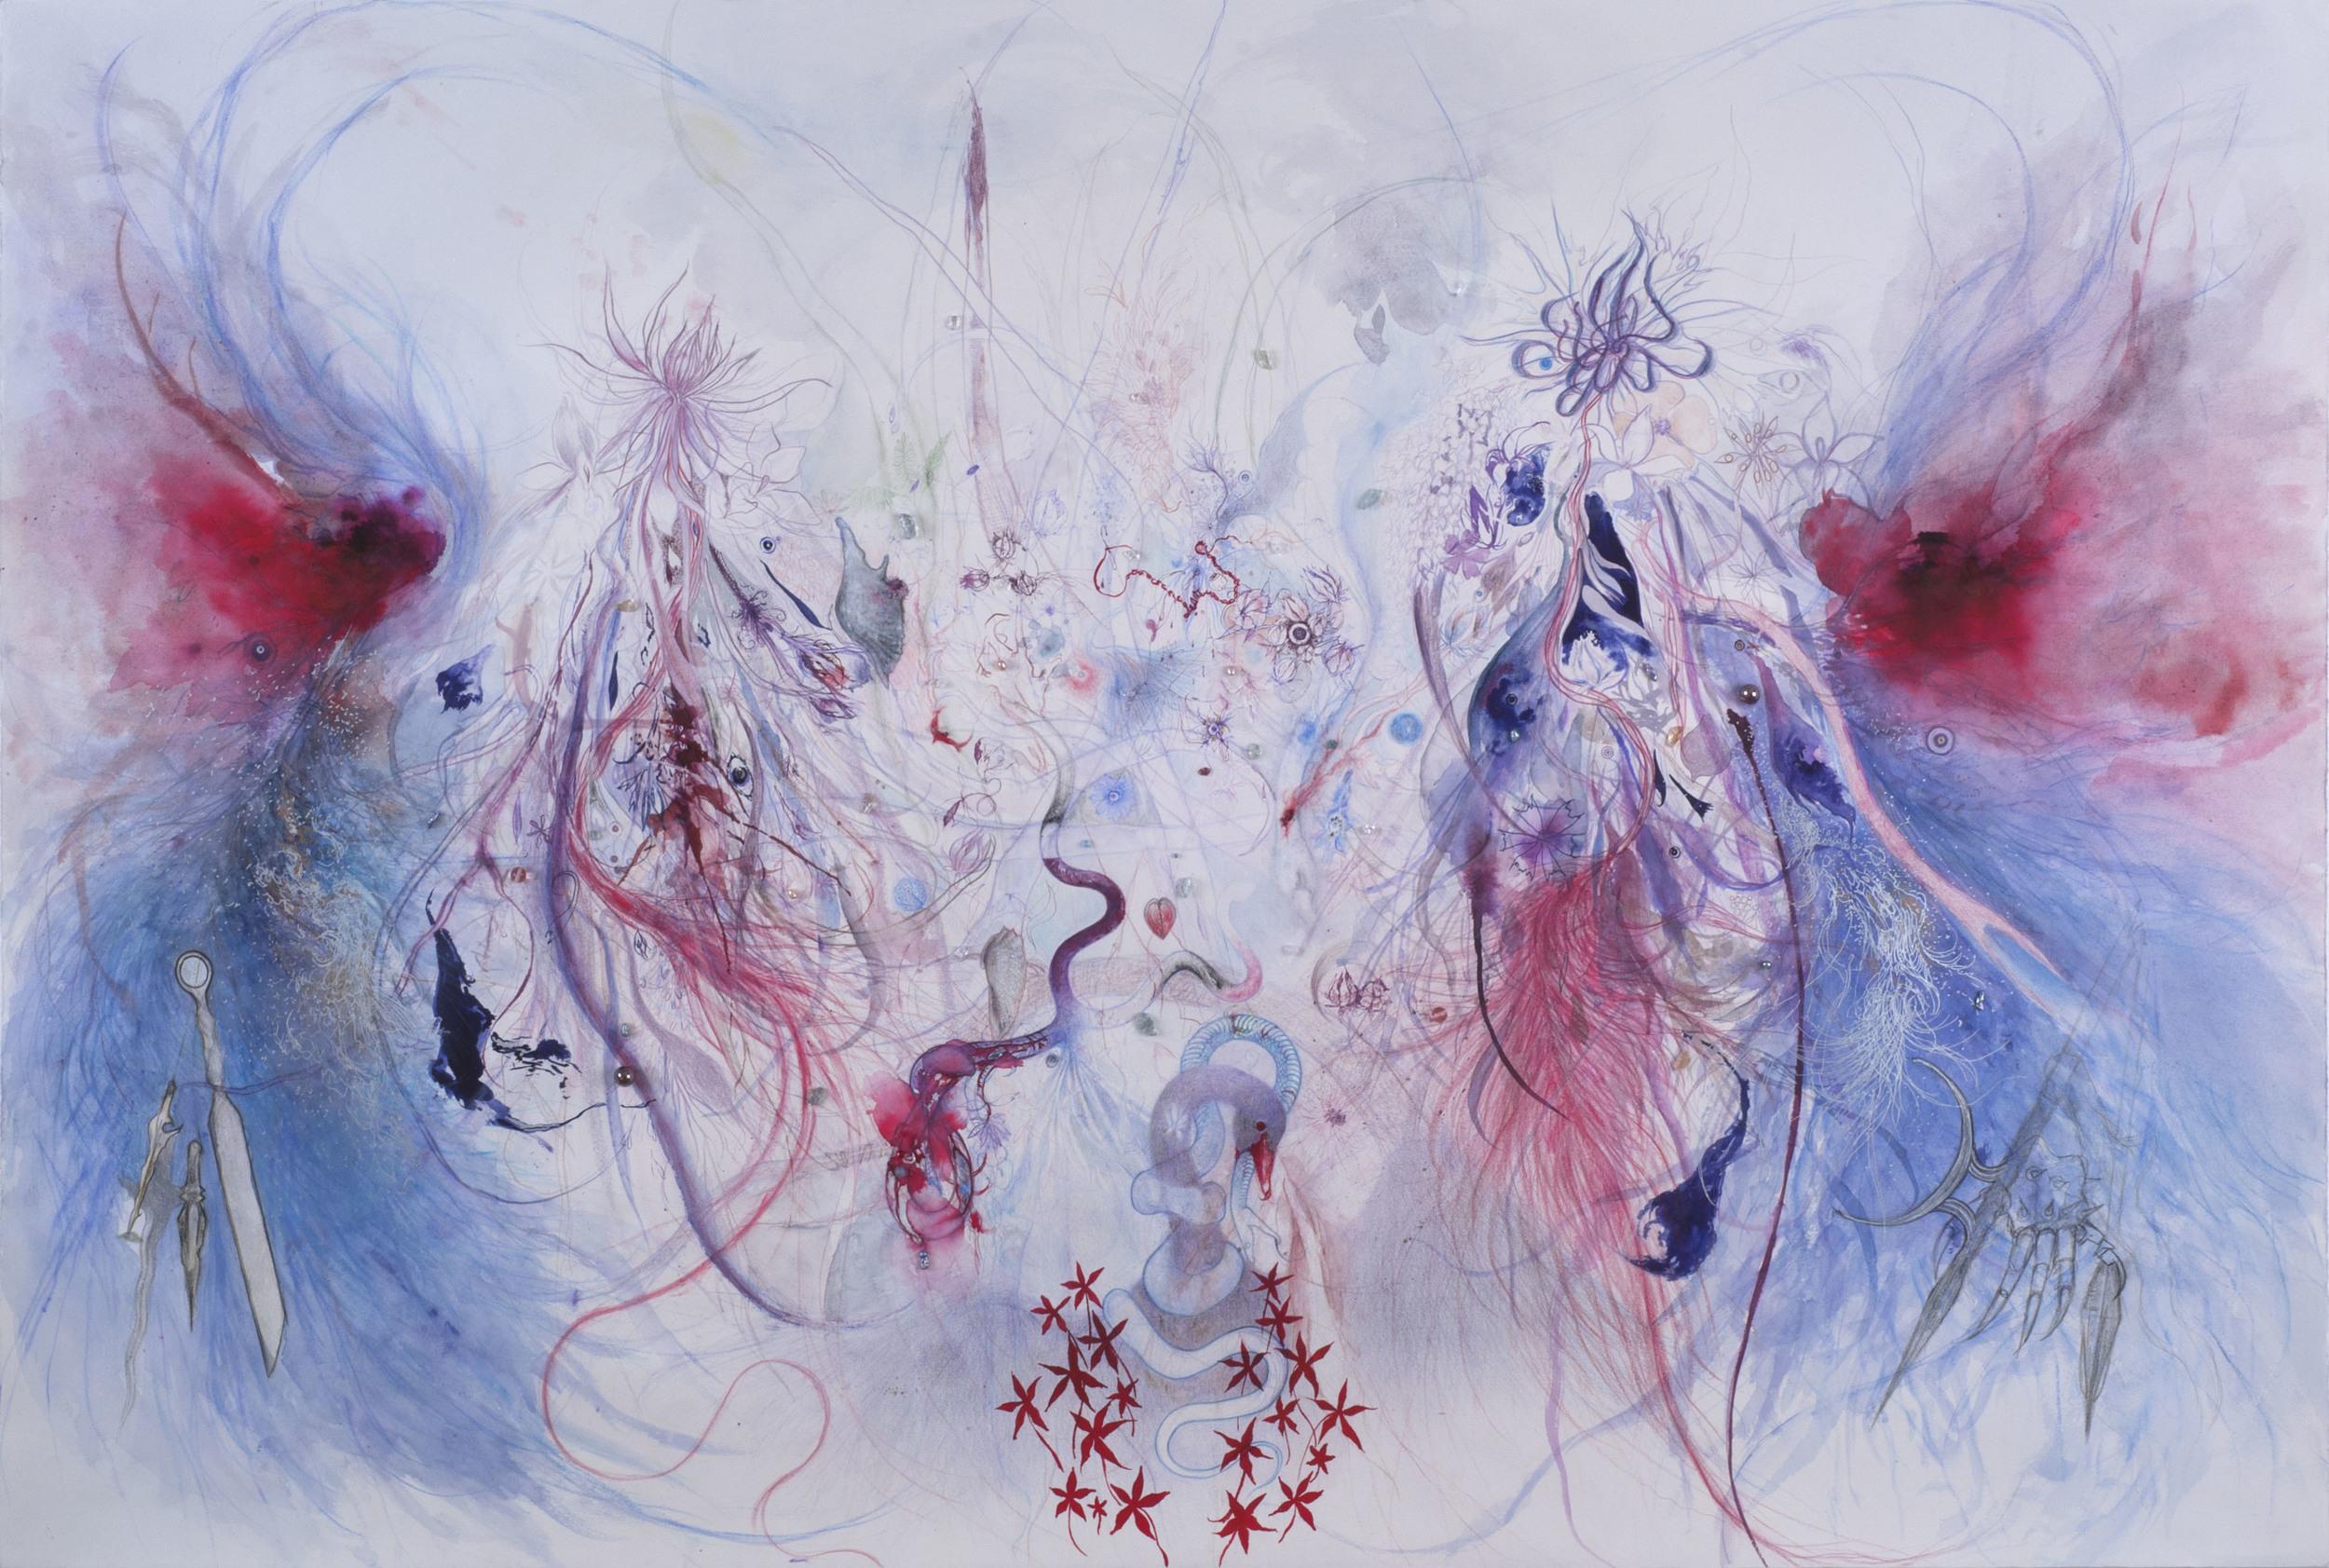 Bea Kwan Lim    Animus Inviolabilis  , 2012 Colour pencil, glass & stone beads, graphite, handmade watercolour, ink on paper 30 x 44 inches / 76.2 x 111.8 cm / BLi 6